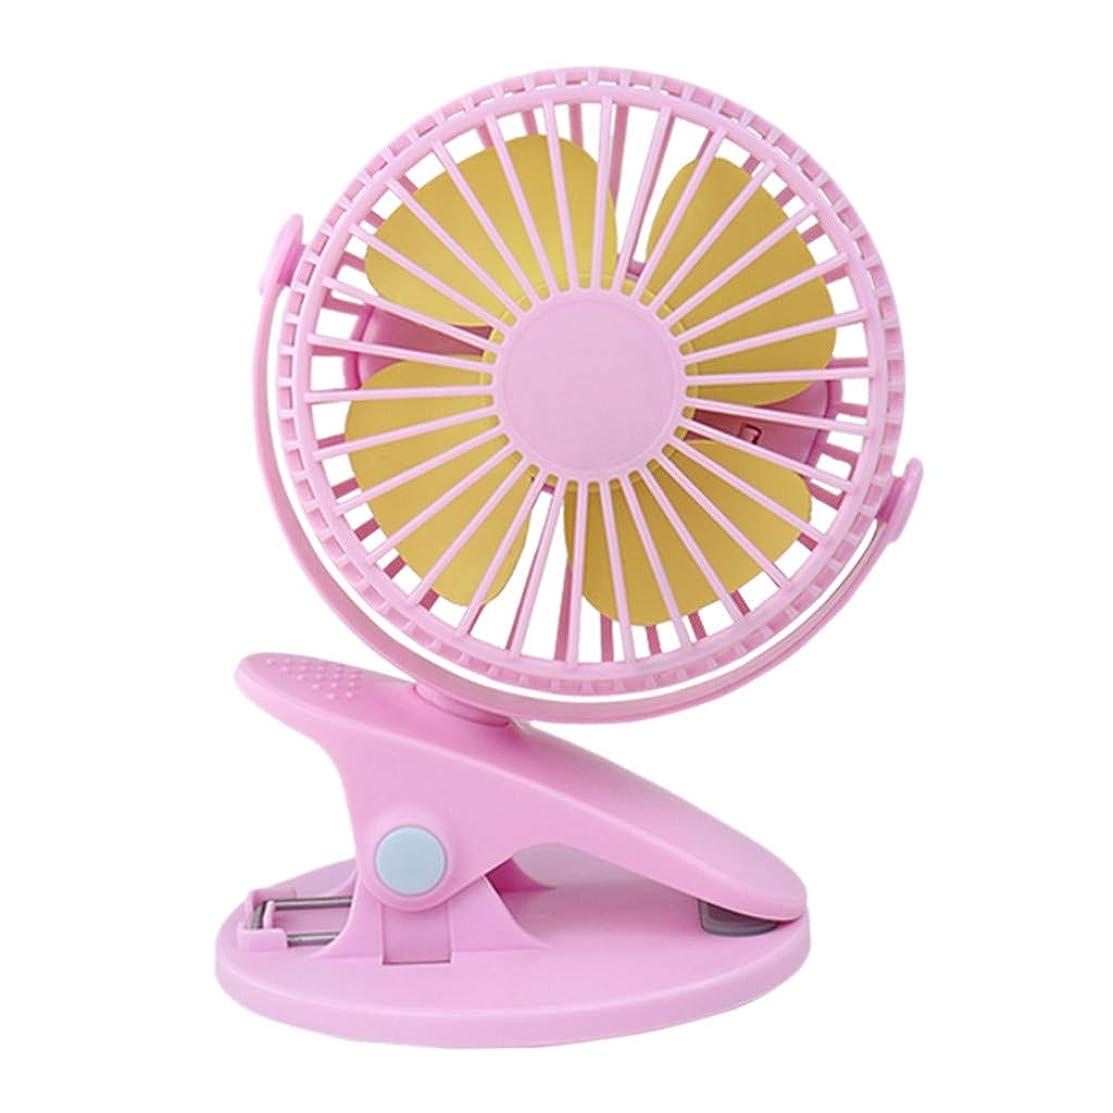 Akabsh_fans Portable 360° USB Rechargeable Camping Fan,Mini Clip On Pram Cot Car Desktop Fan,Safe & Durable